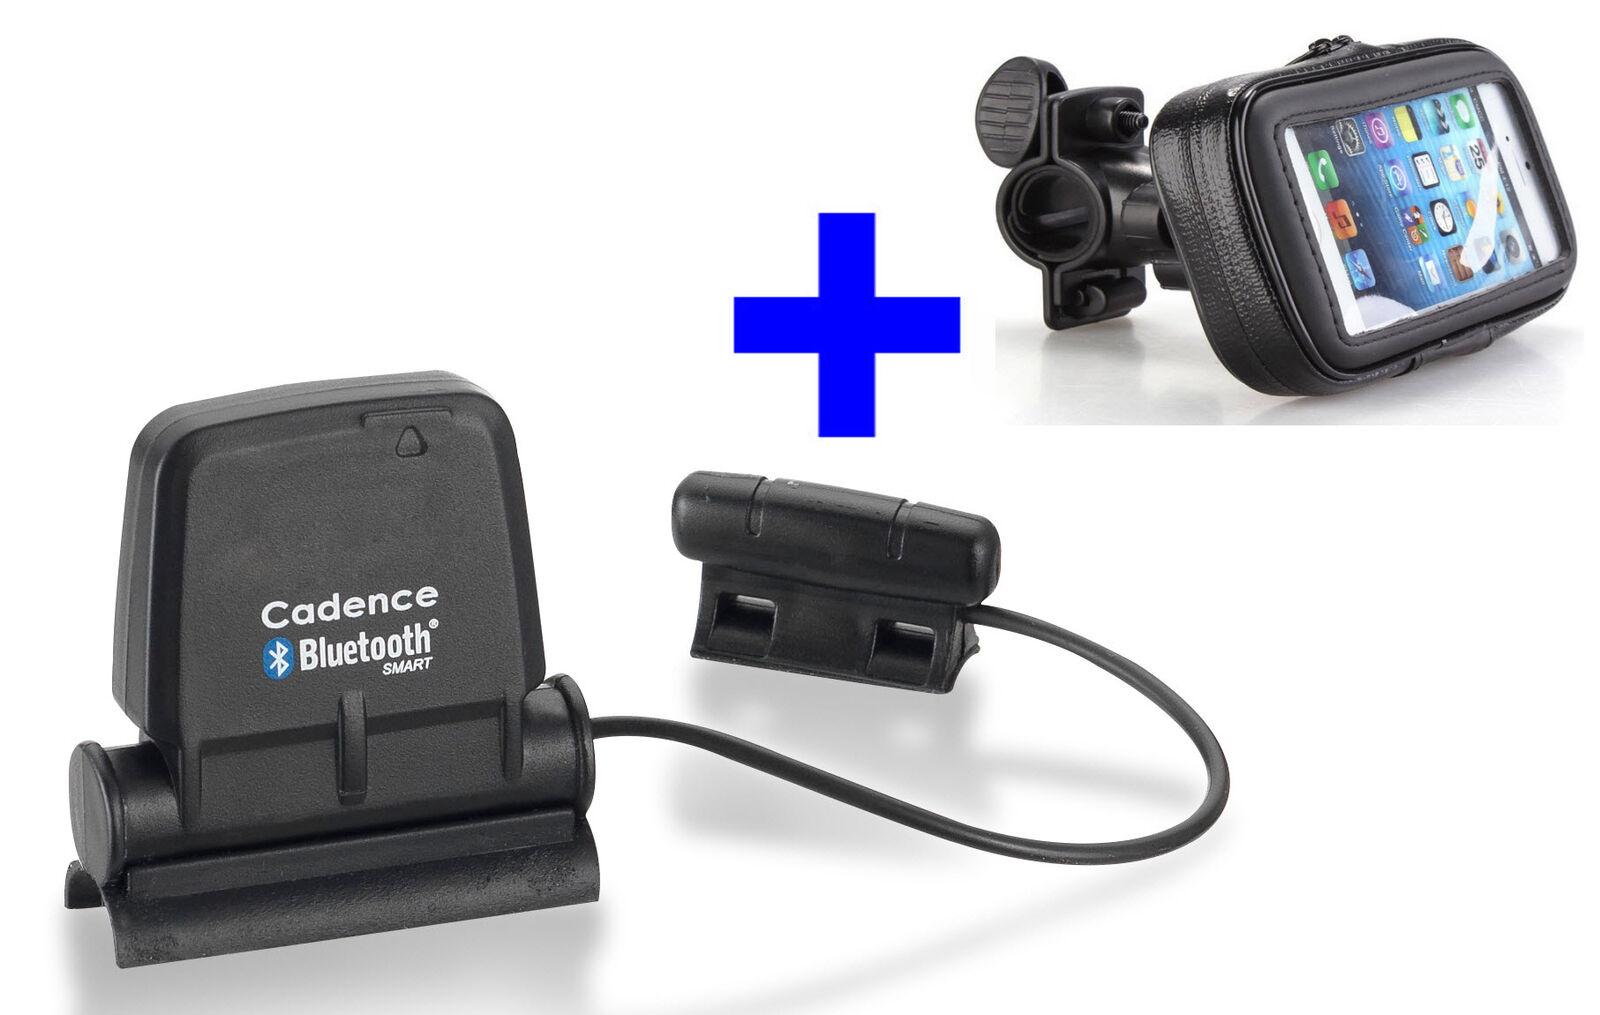 azultooth Speed Cadence sensor + bicicleta Haicom para runtastic s4 s5 s6 s7 s8 s9